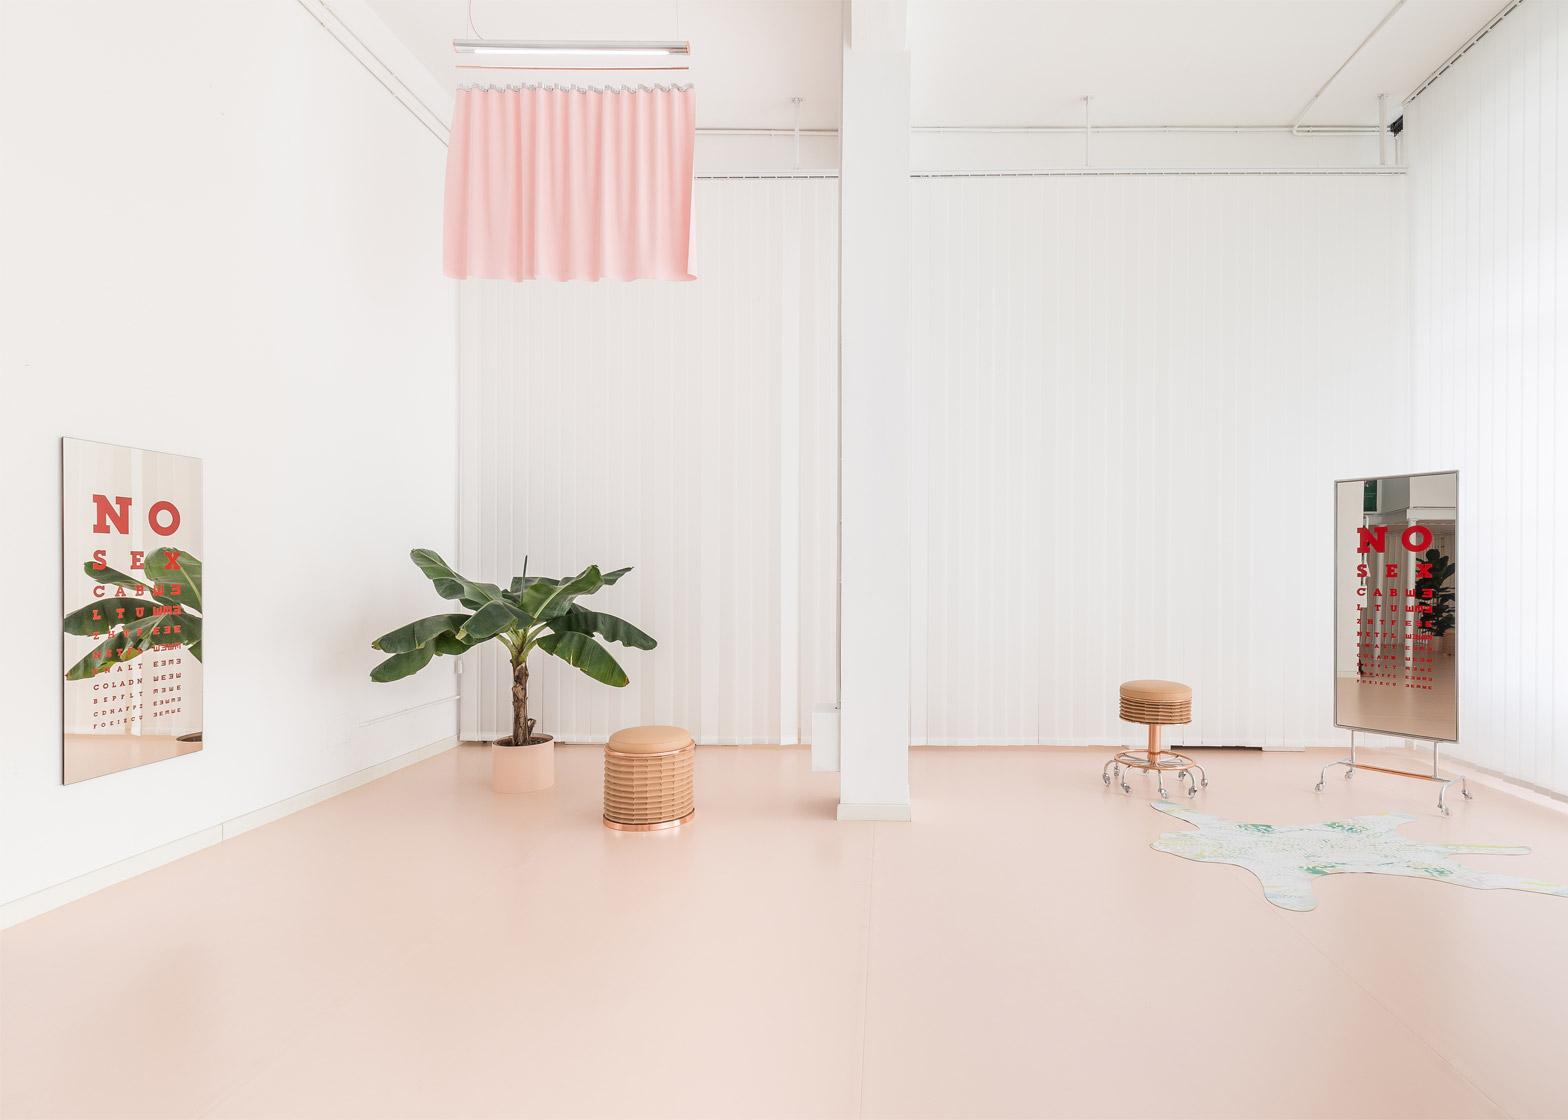 Atelier Biagetti's No Sex is surreal sex clinic-cum-sanctuary